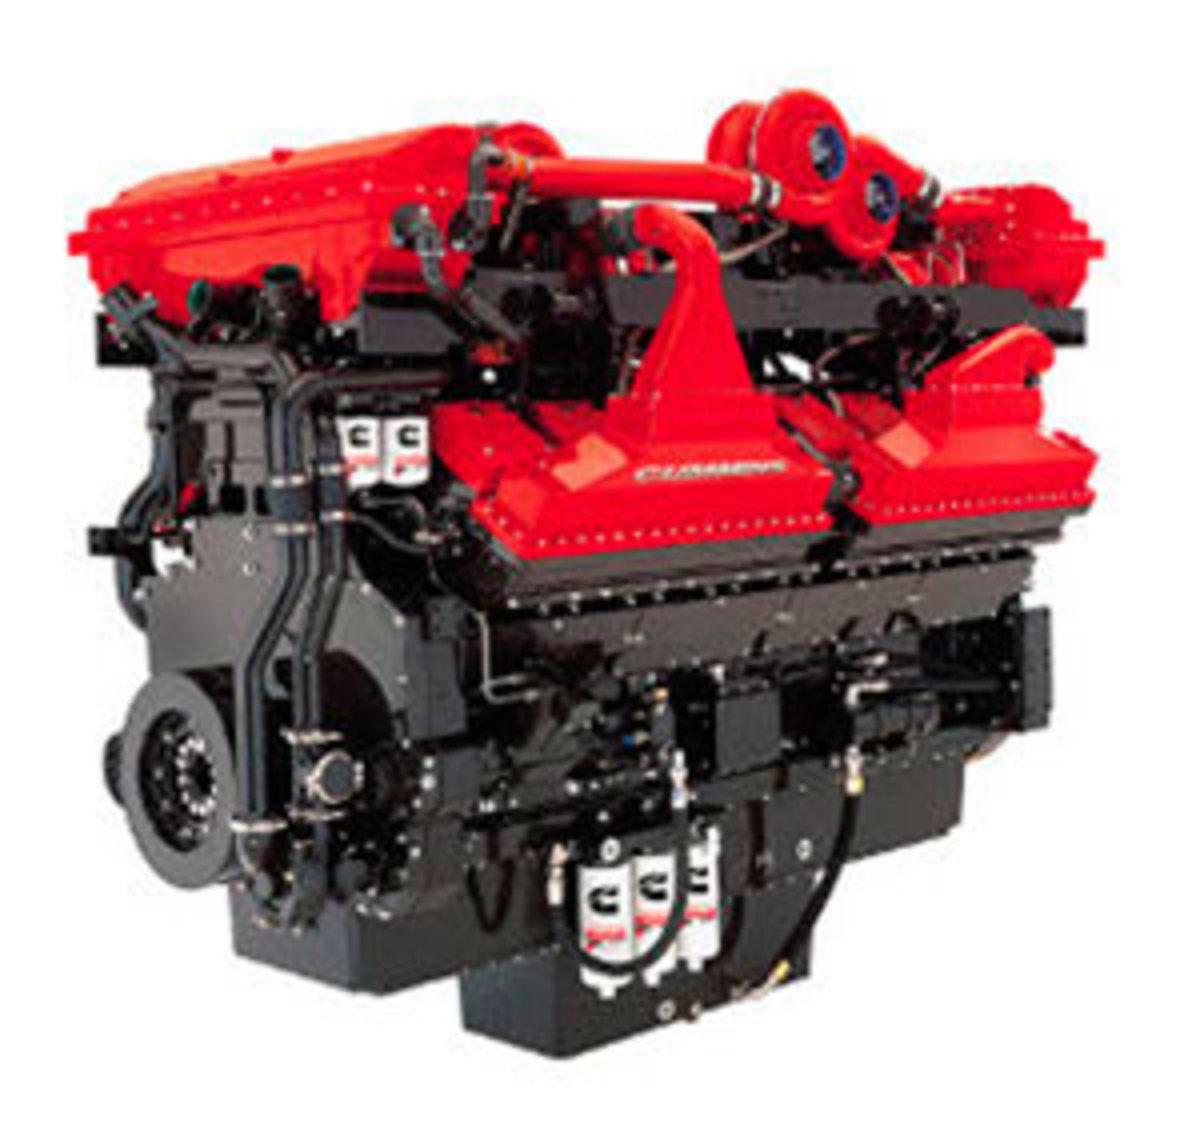 Cummins QSK series engine